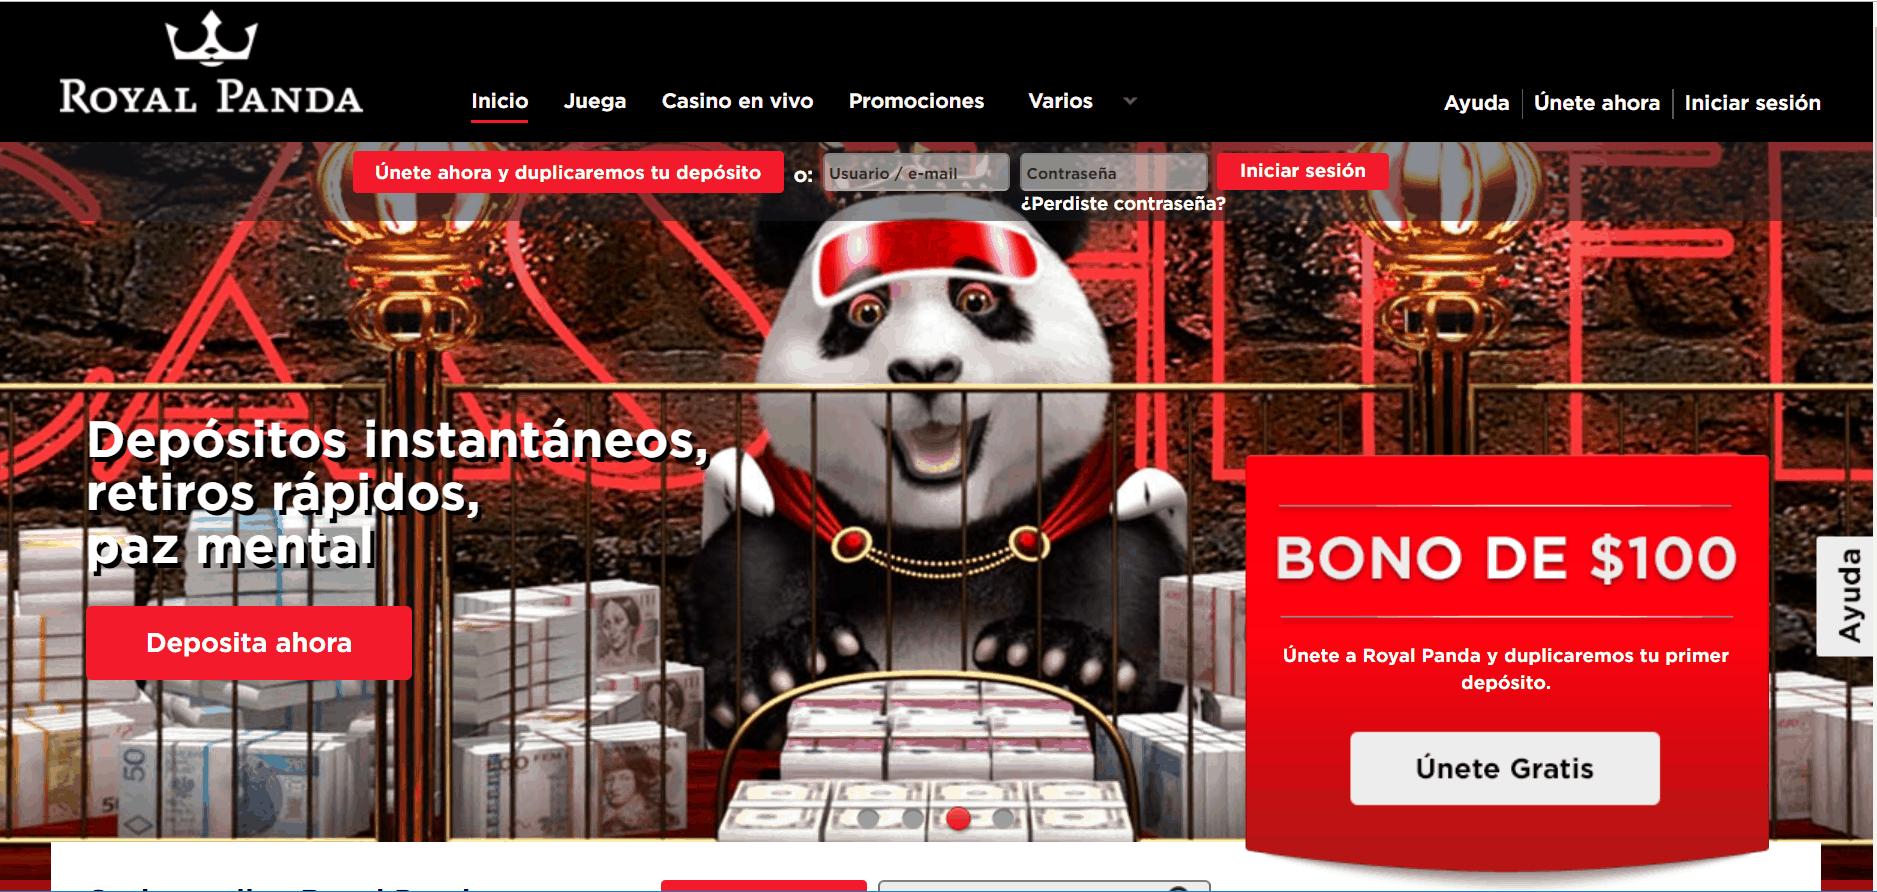 Royal Panda desktop